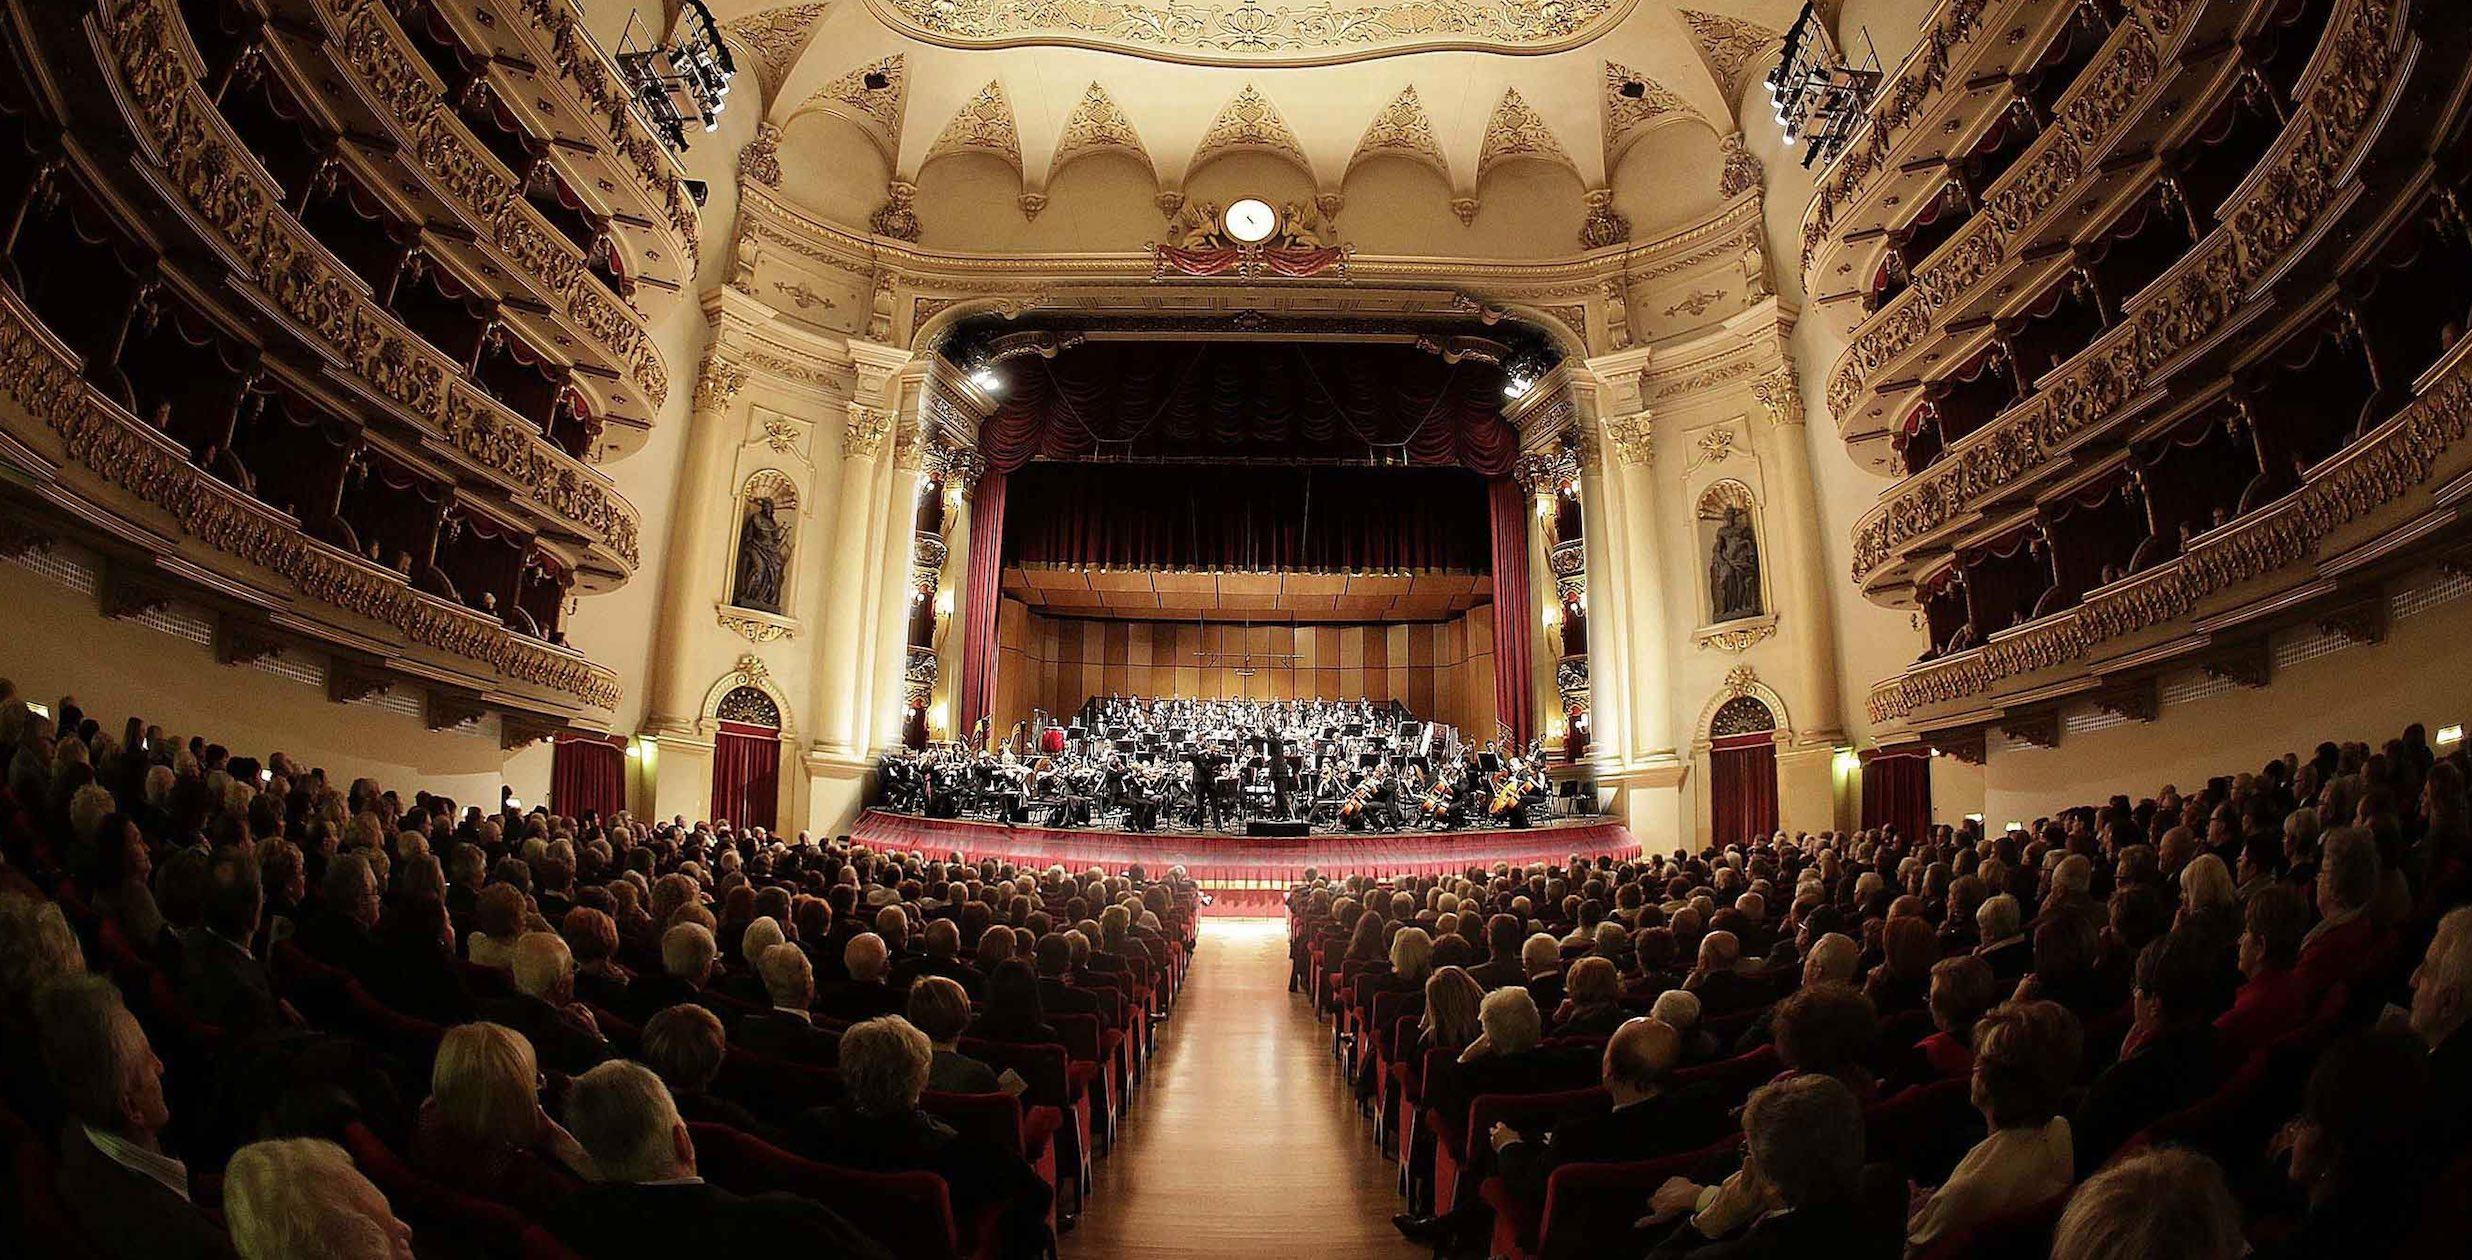 Filarmonico Verona 18/19, Arena di Verona, Stagione 2018/2019